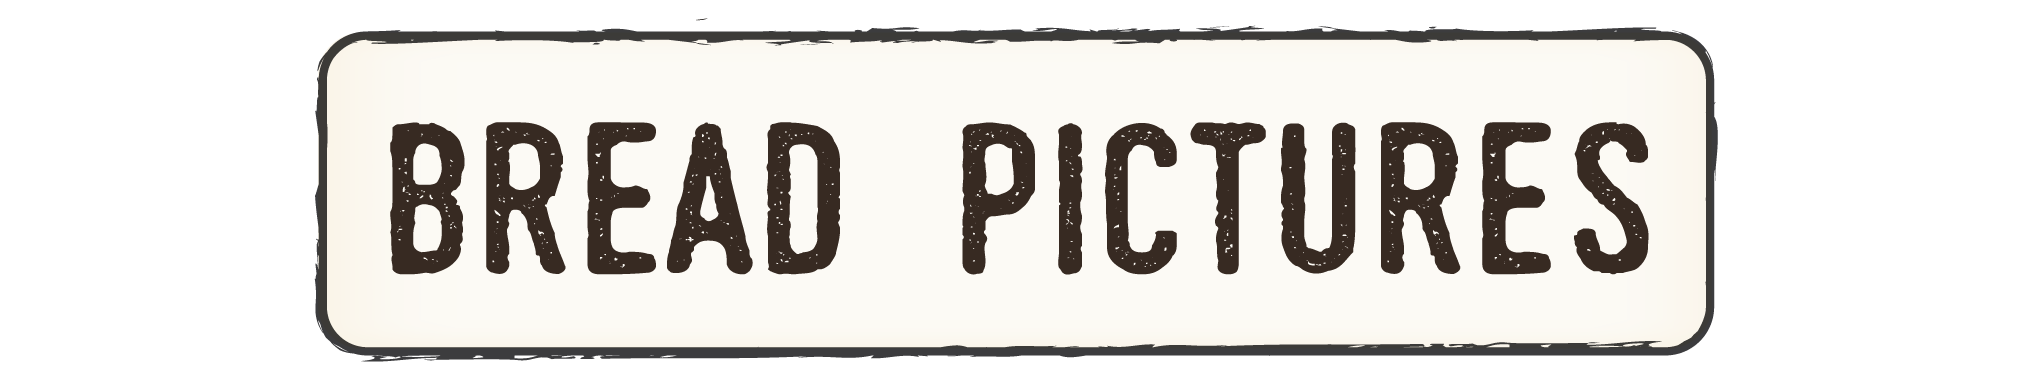 Website Files-64.png